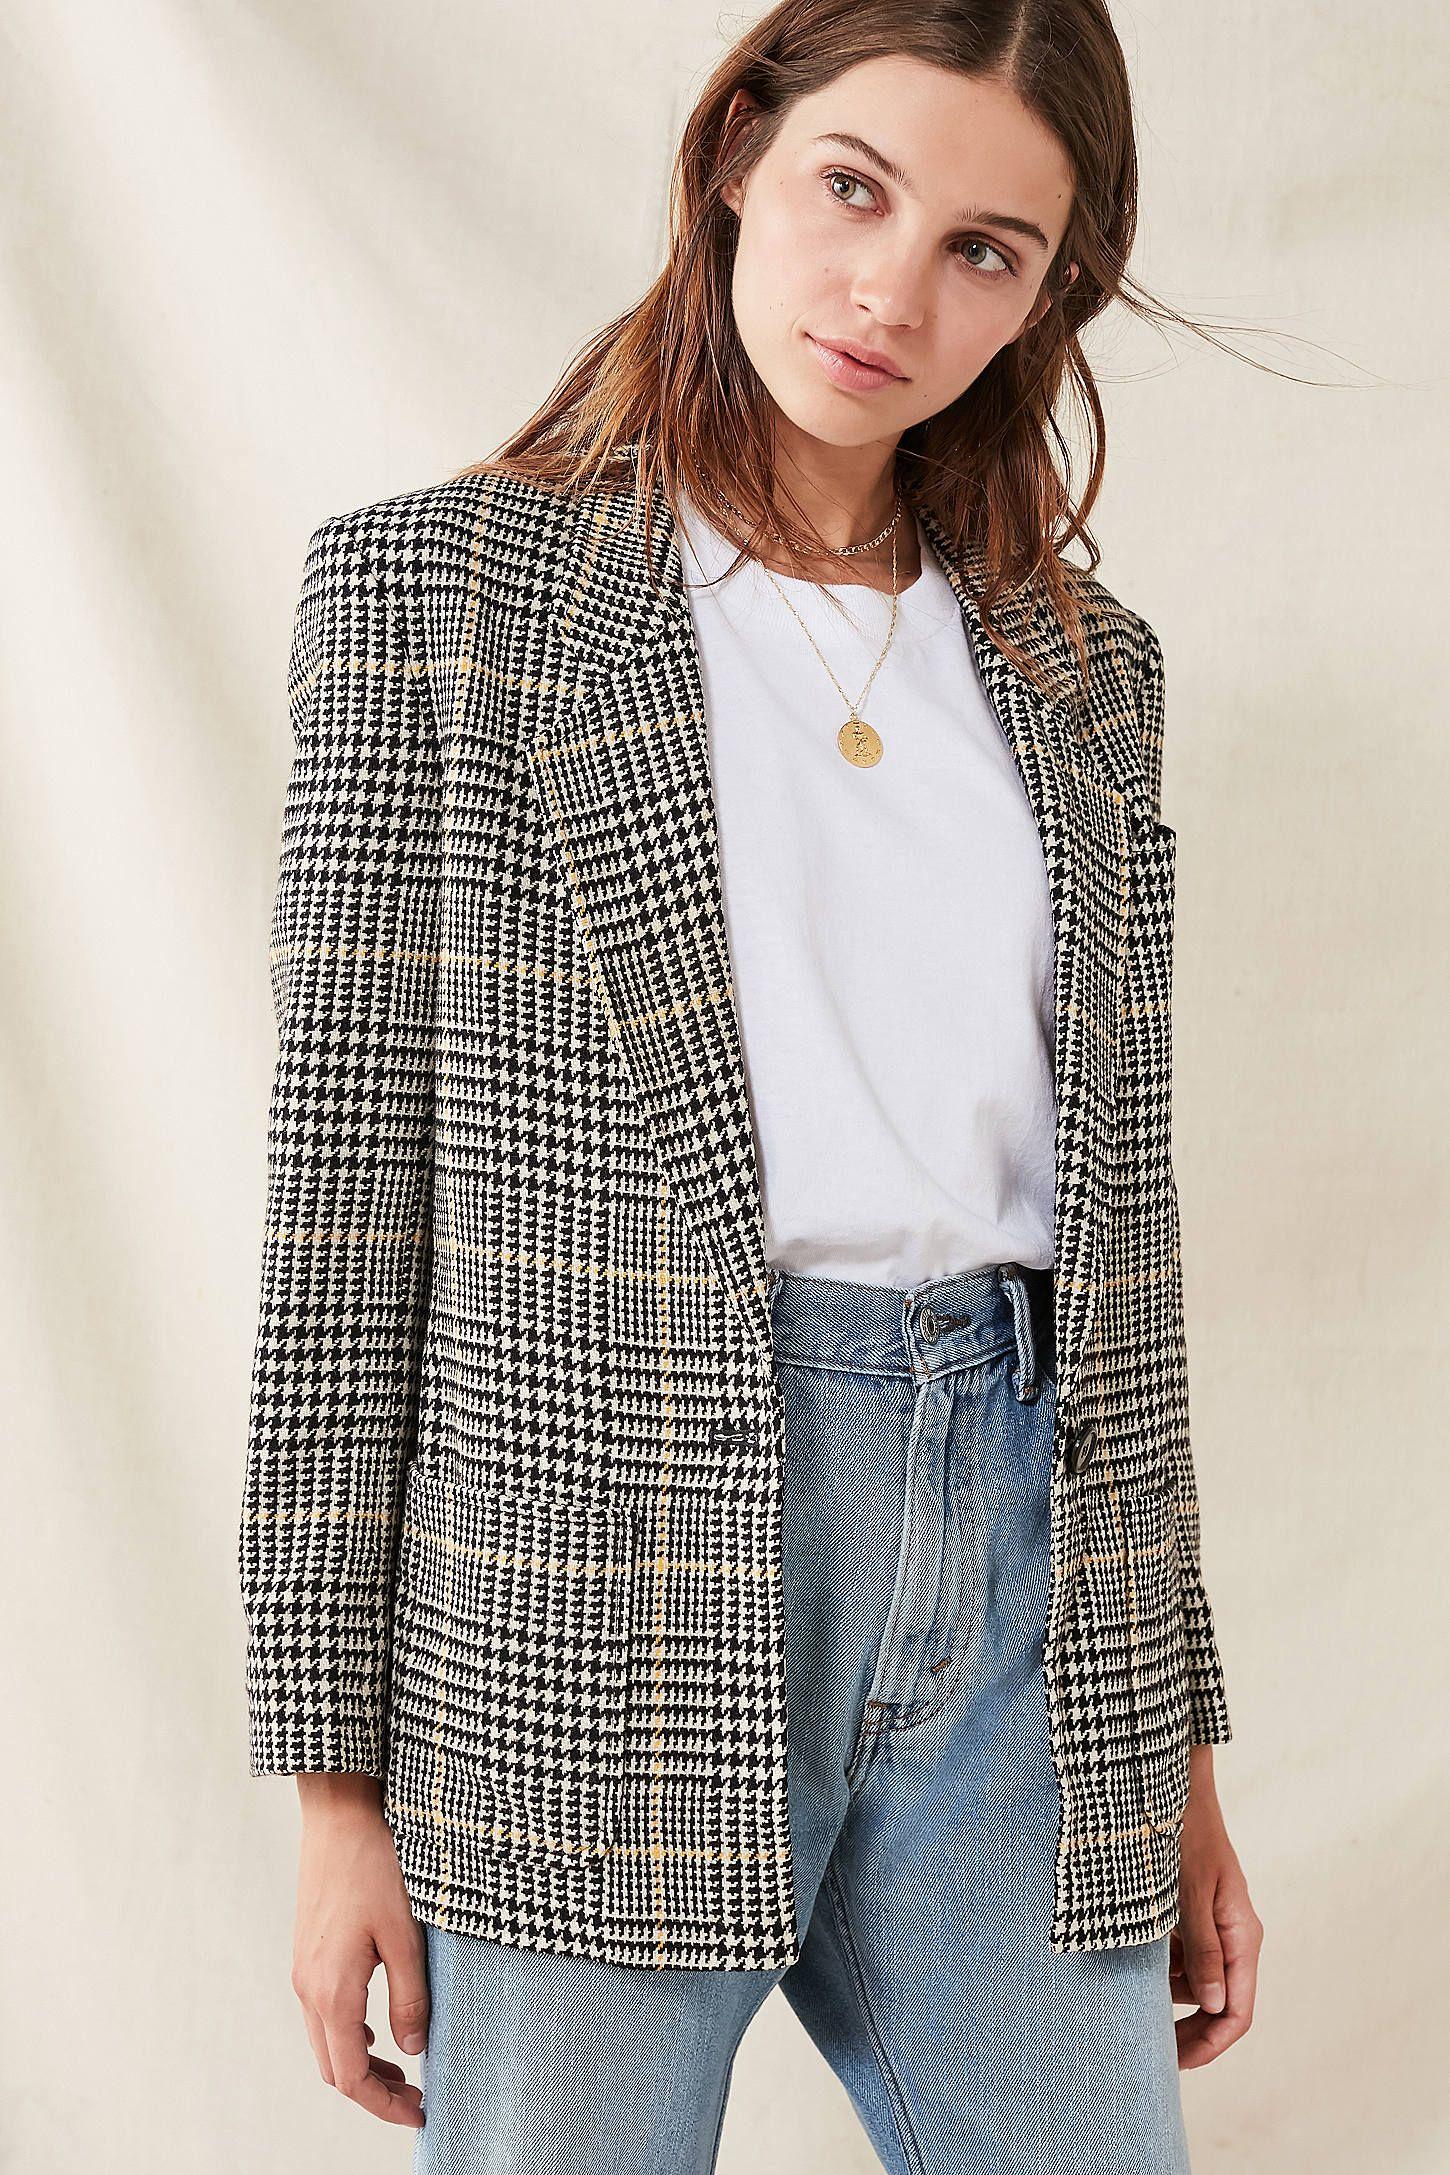 Vintage Oversized Blazer Fashion Dress Up Jeans Fashion Week Trends